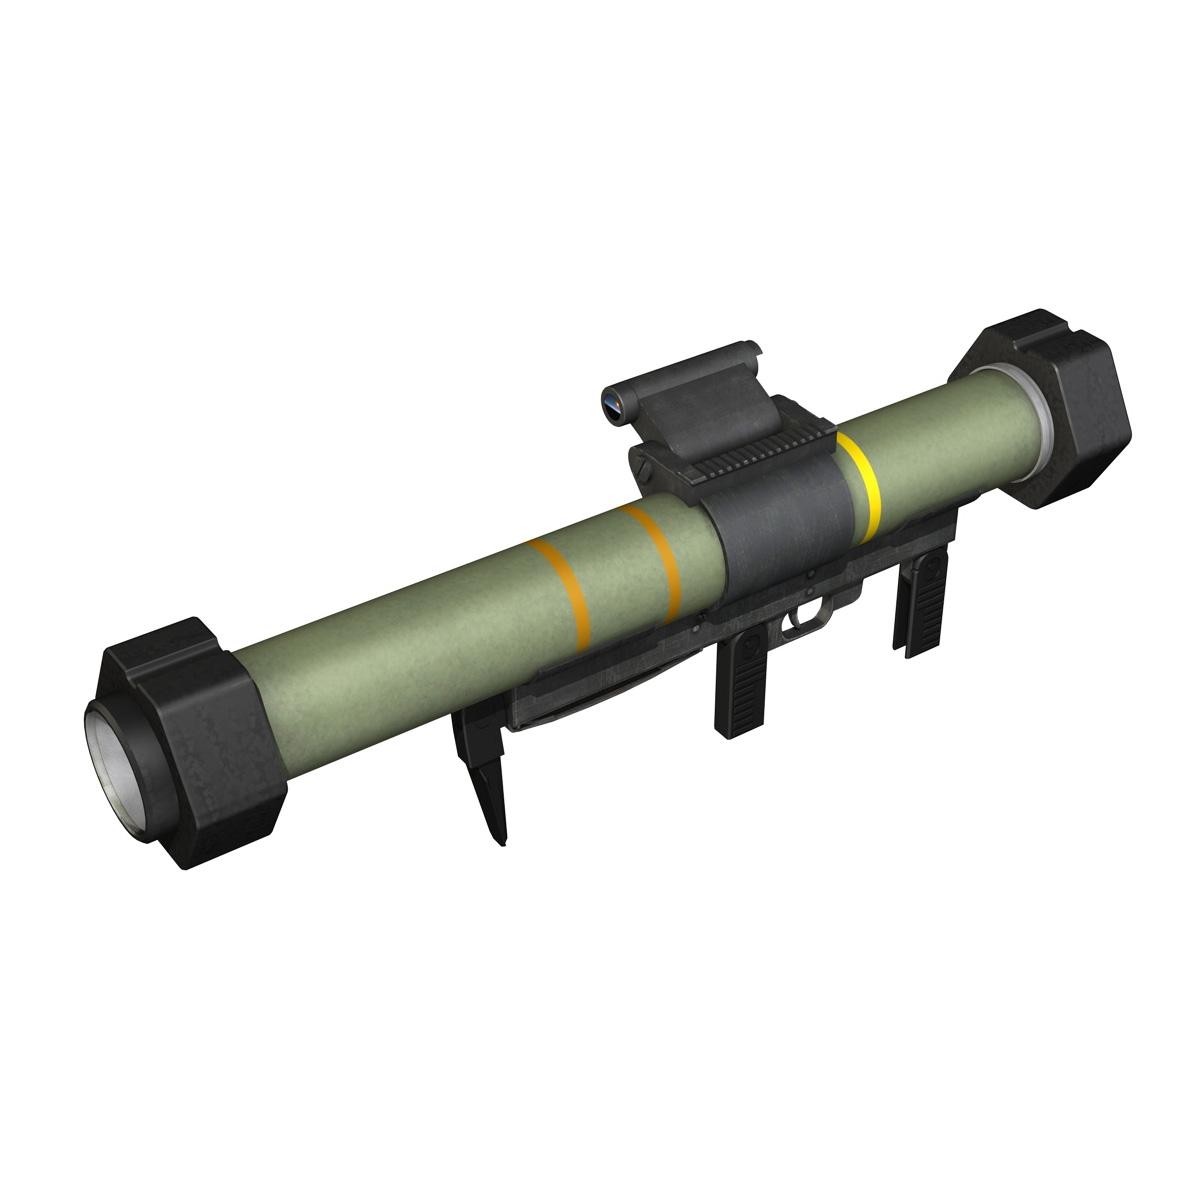 эсрэг хуяг Launcher Matador 3d загвар 3ds fbx c4d lwo obj 197072